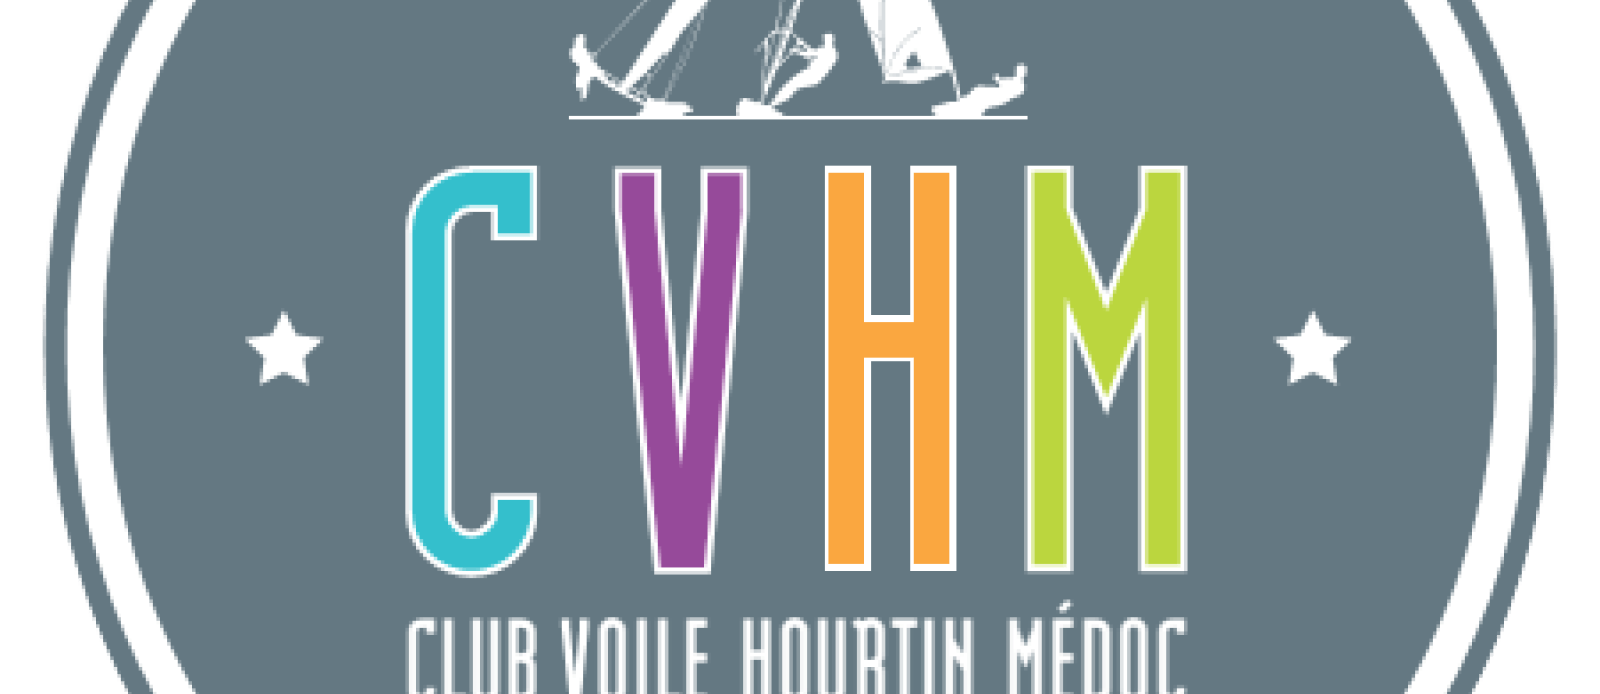 Club de Voile Hourtin Médoc